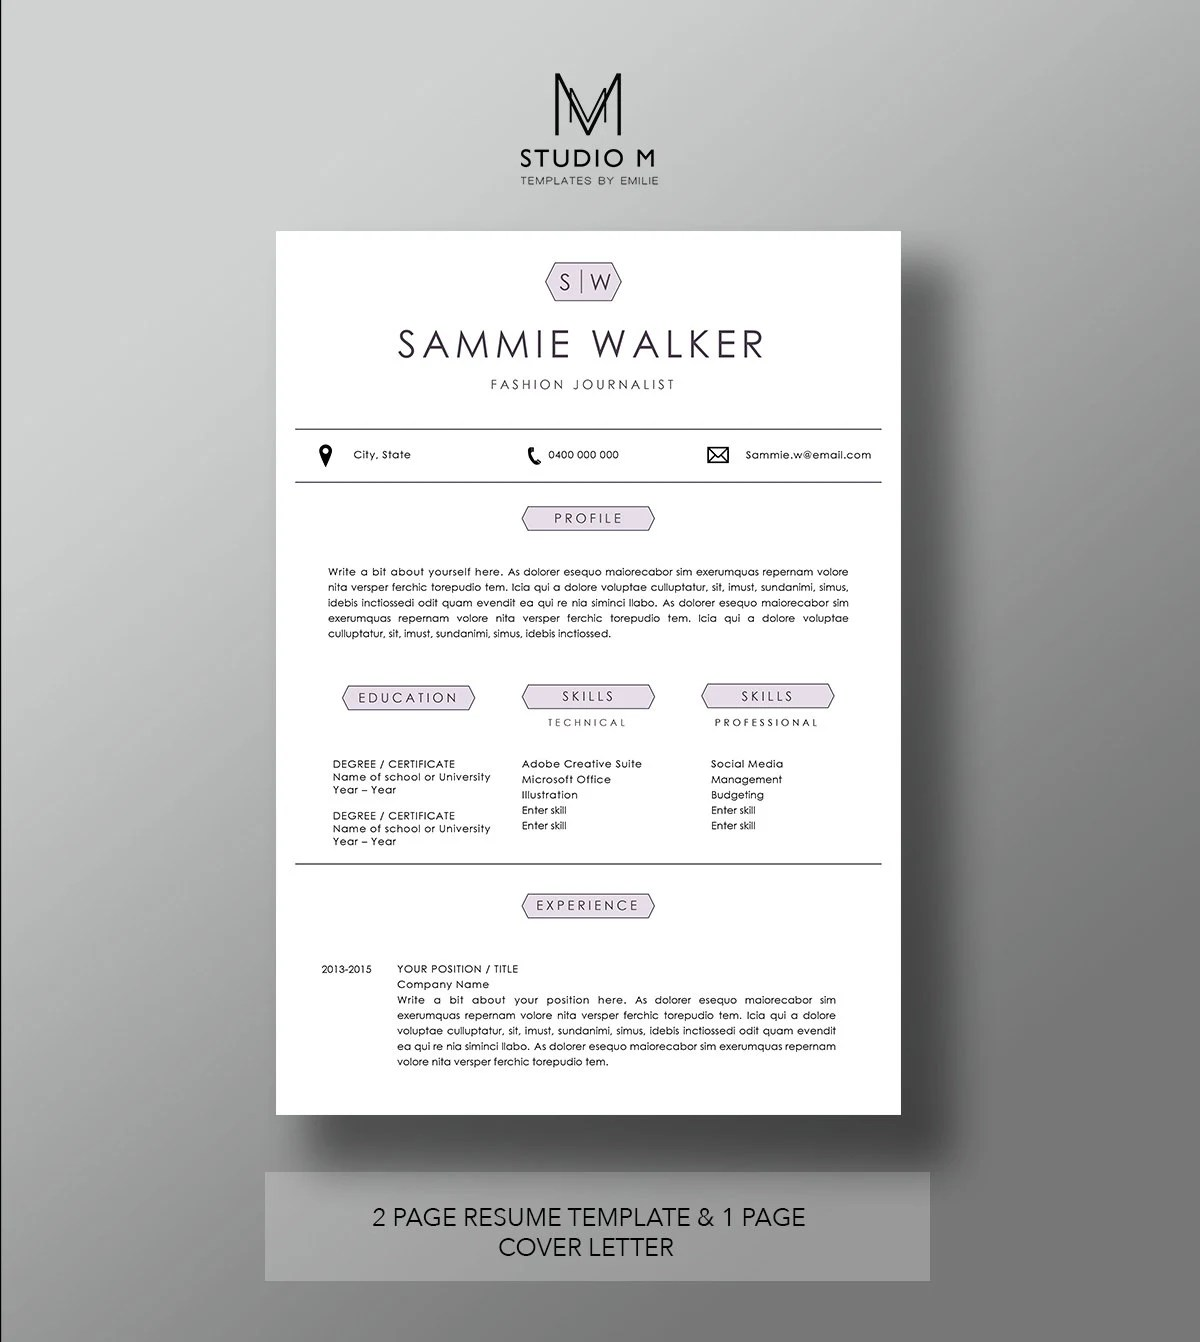 modern resume template 2 page - Juvecenitdelacabrera